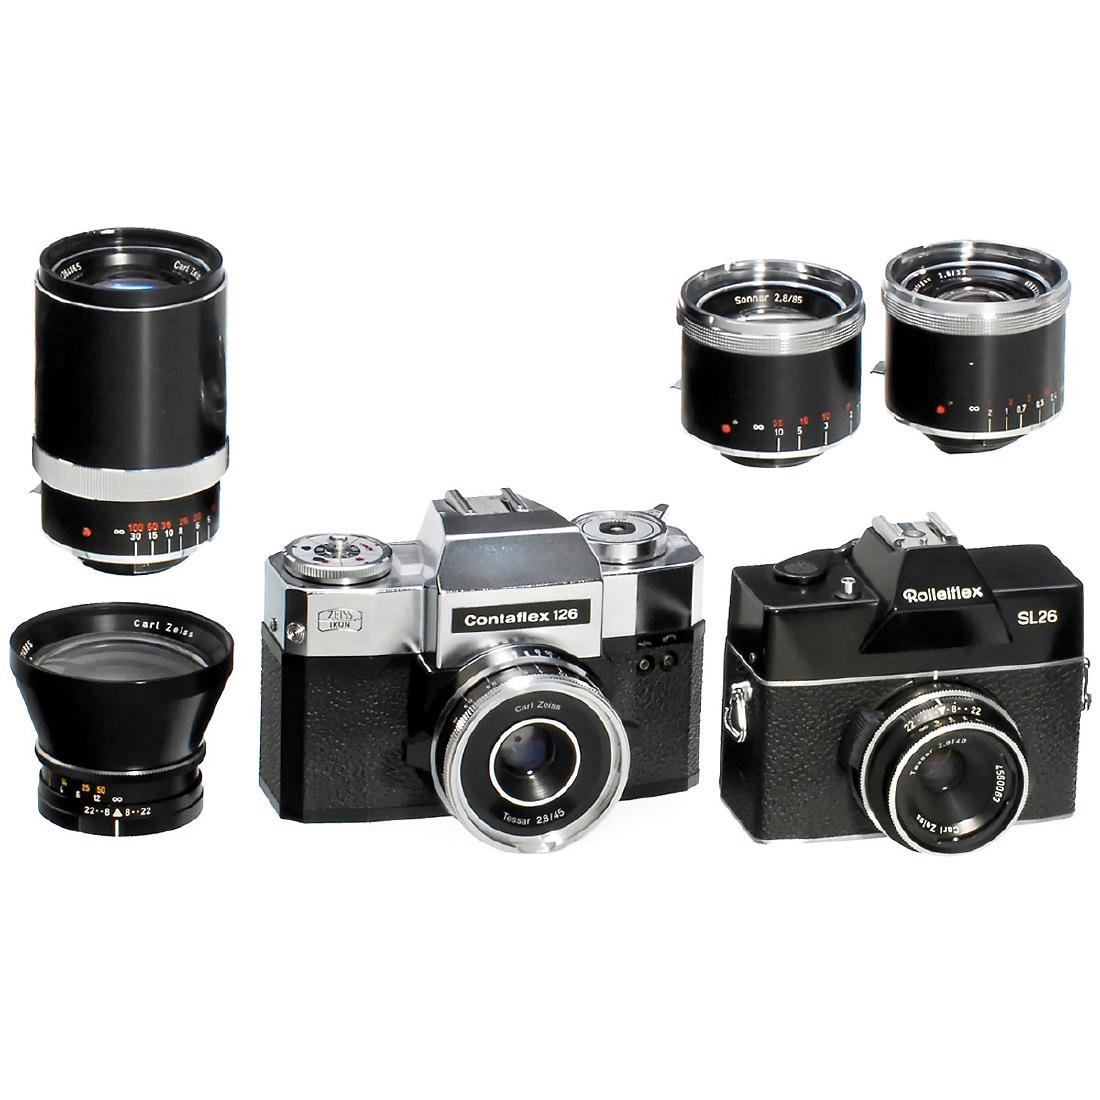 Contaflex 126 and Rolleiflex SL26